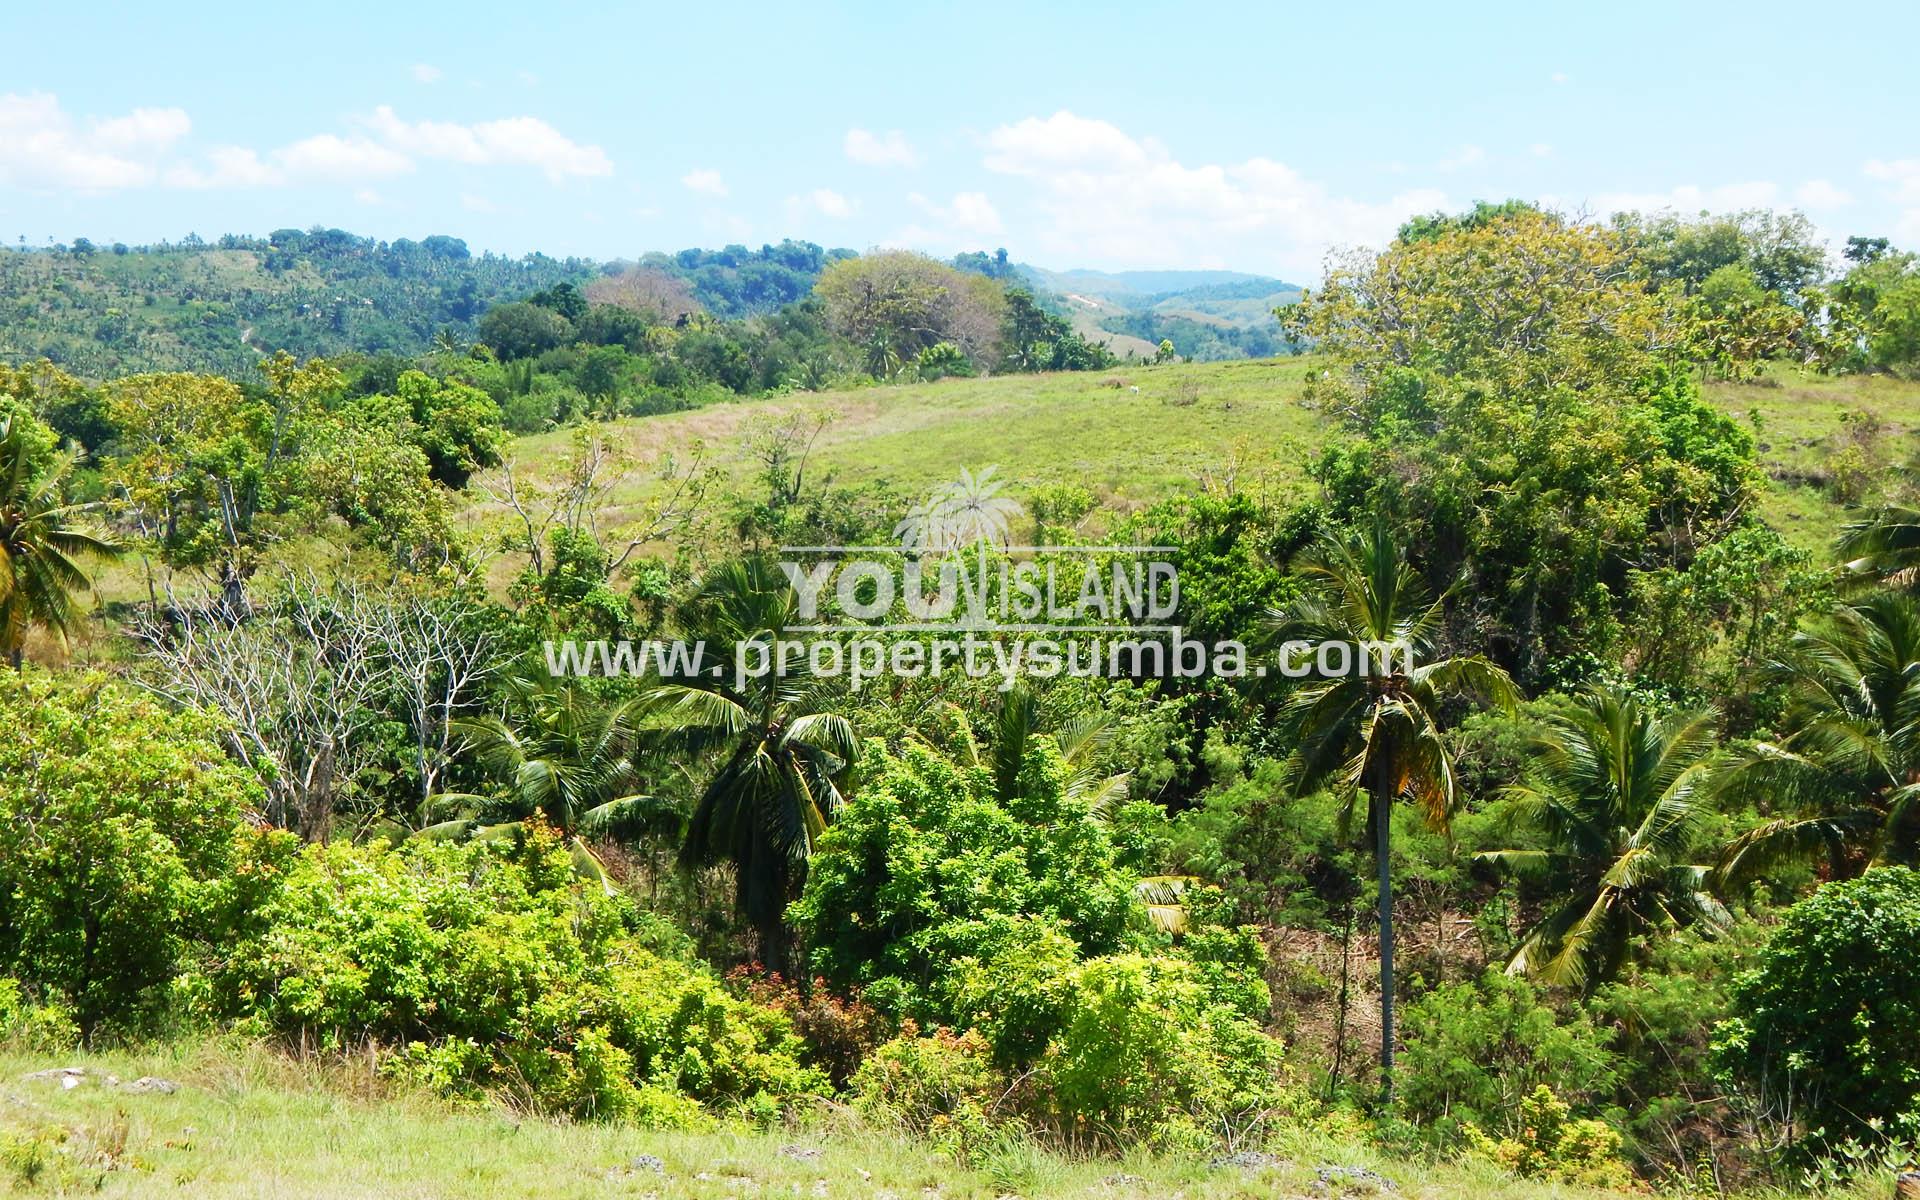 Property Sumba Dangla Rada 523 3057m2 1